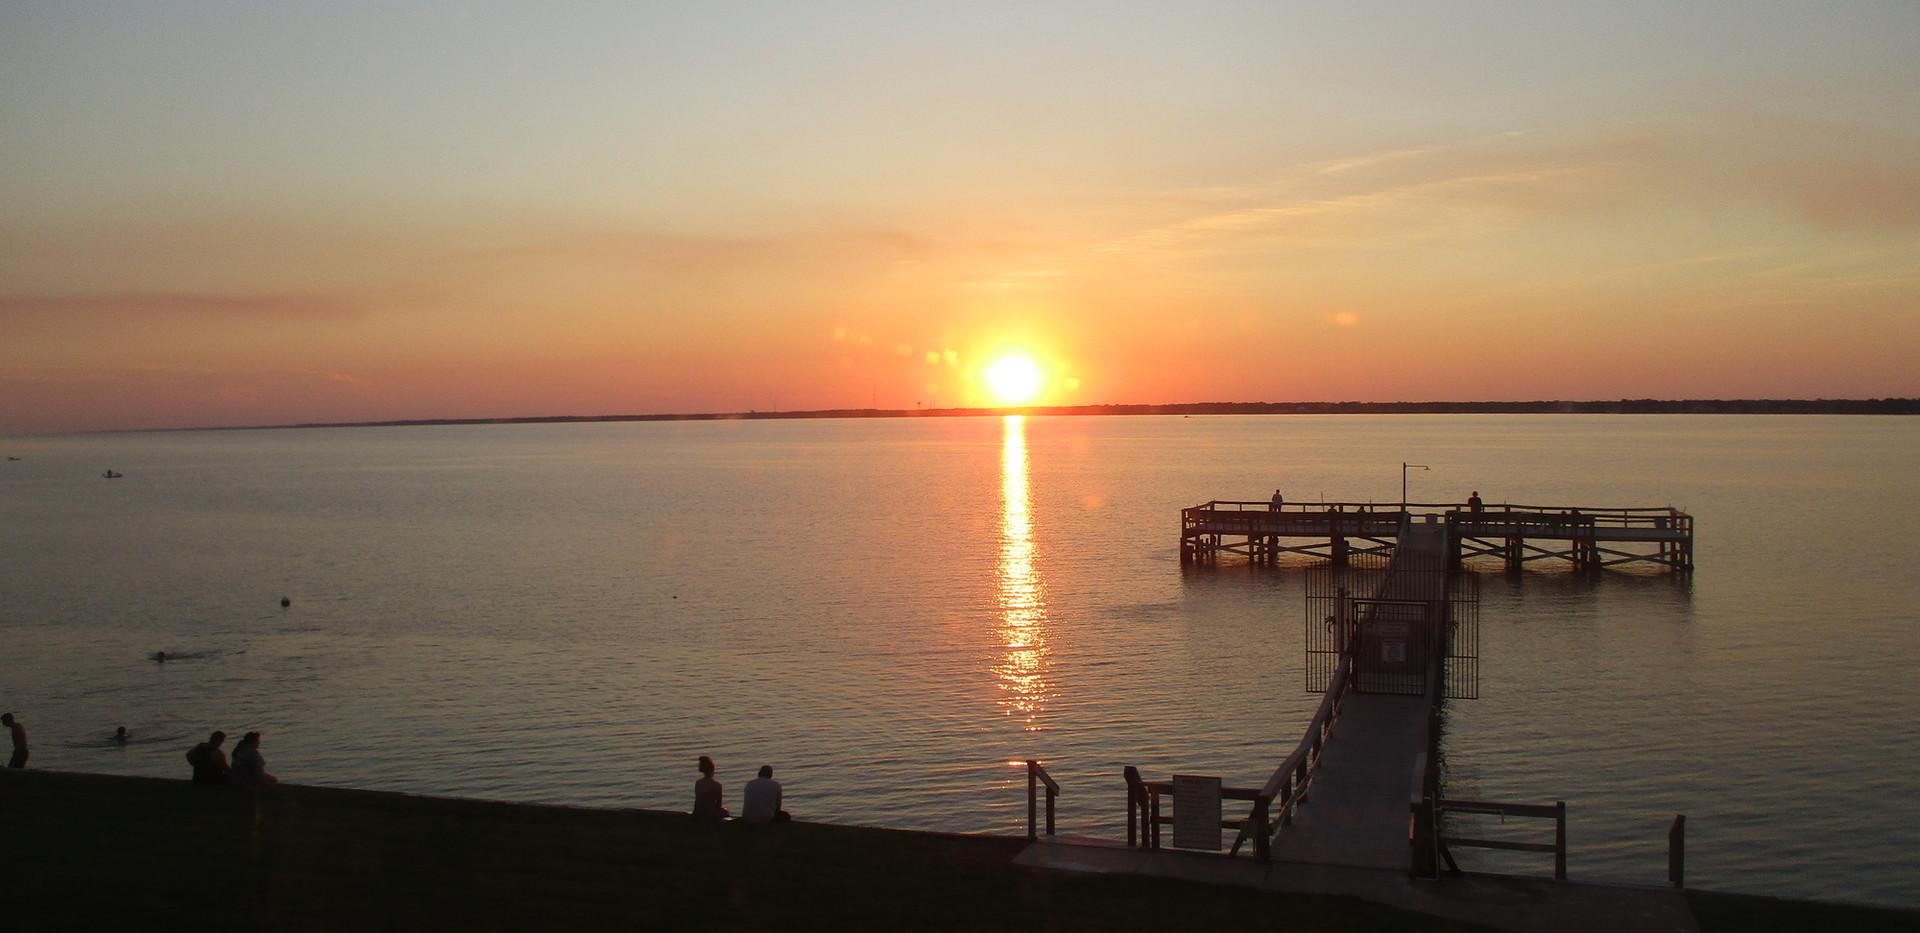 Sunset Harbor Pier